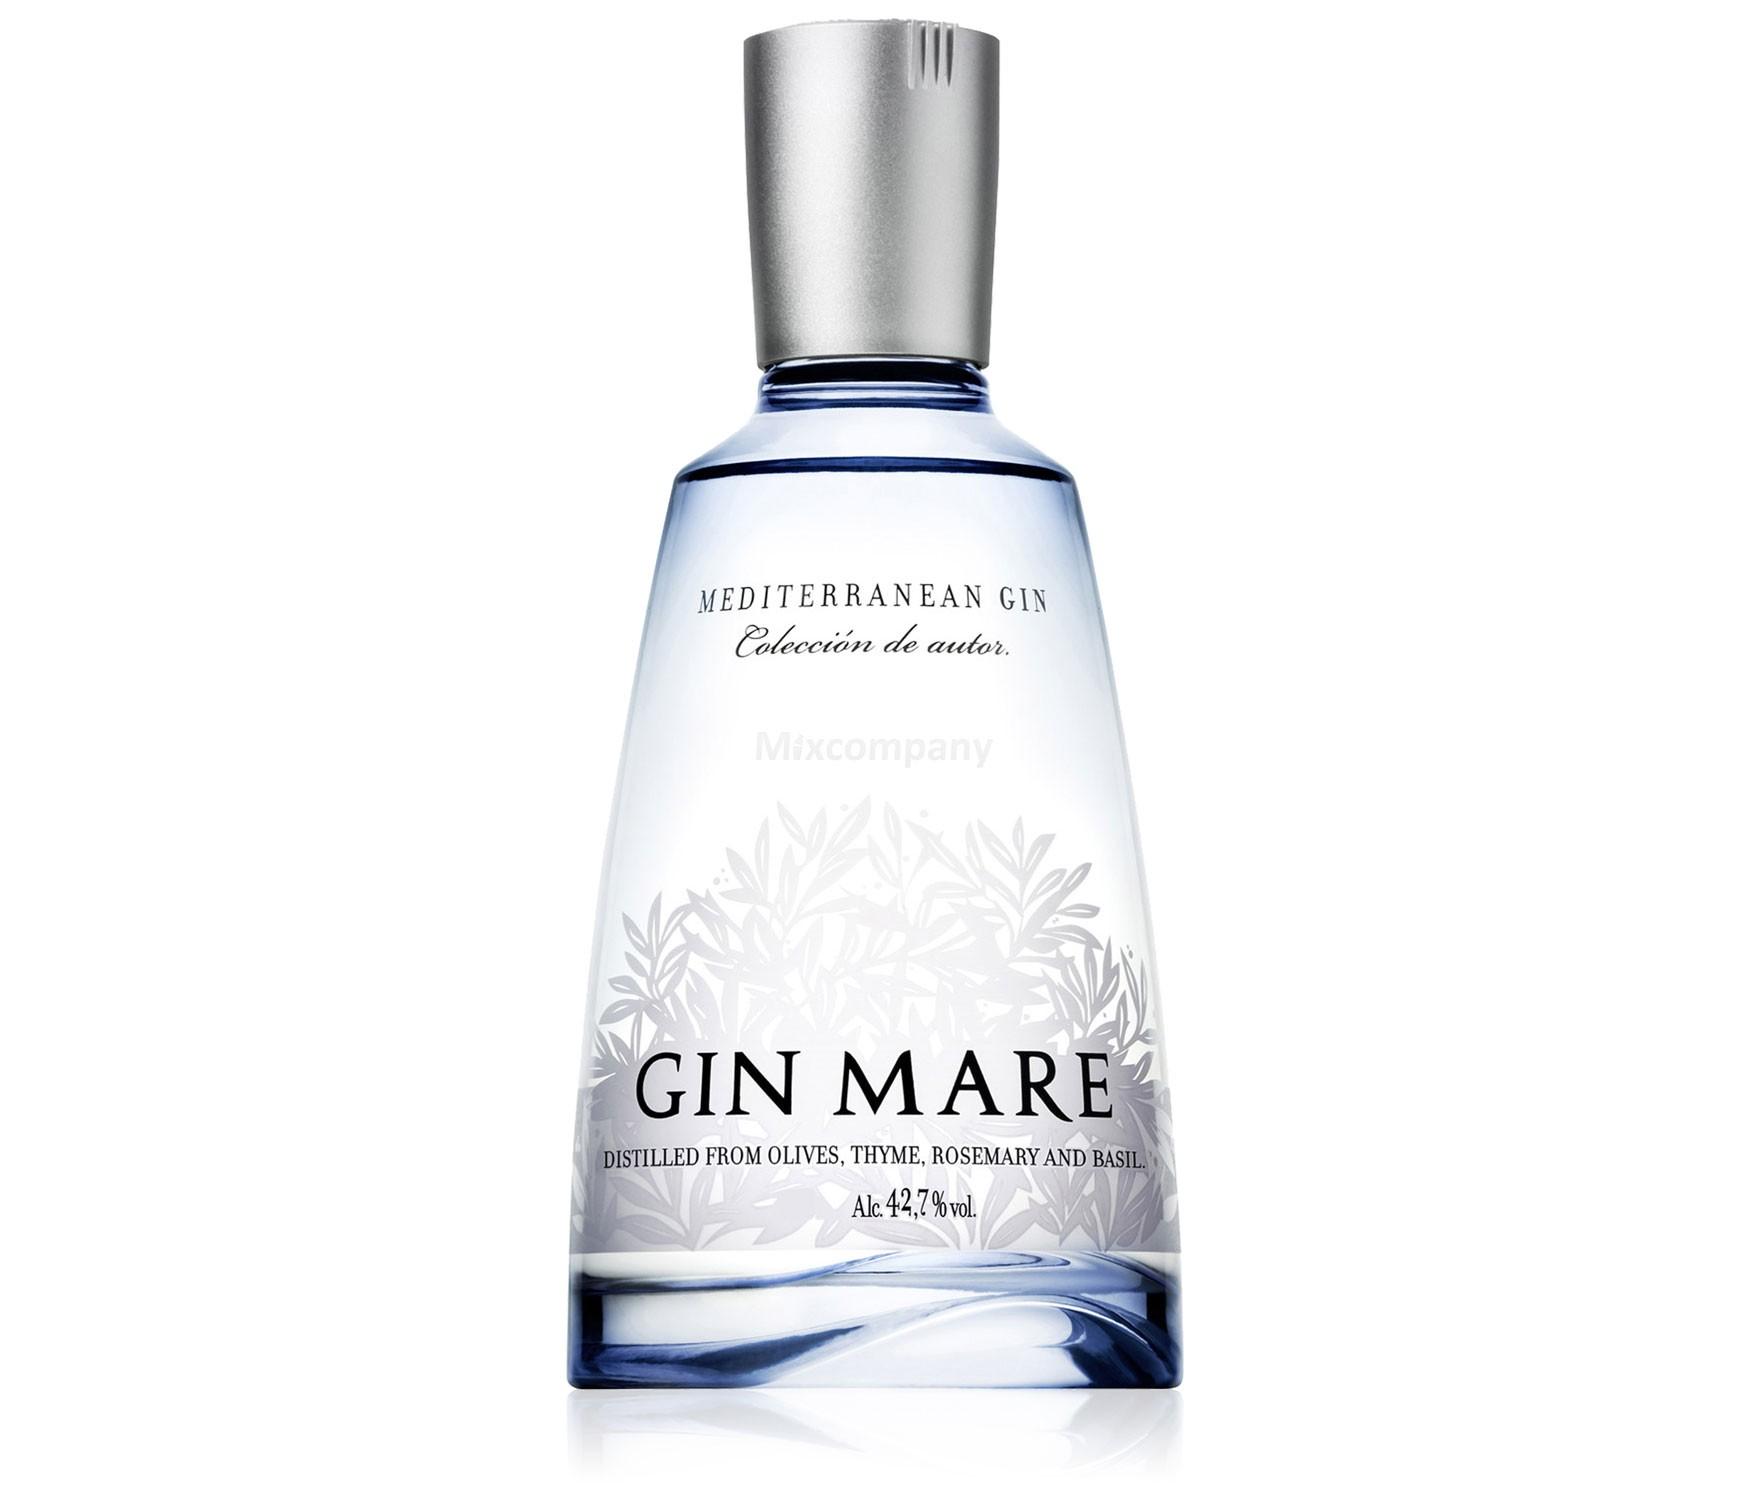 Gin Mare Mediterranean Gin 700ml 0,7L (42,7% Vol)